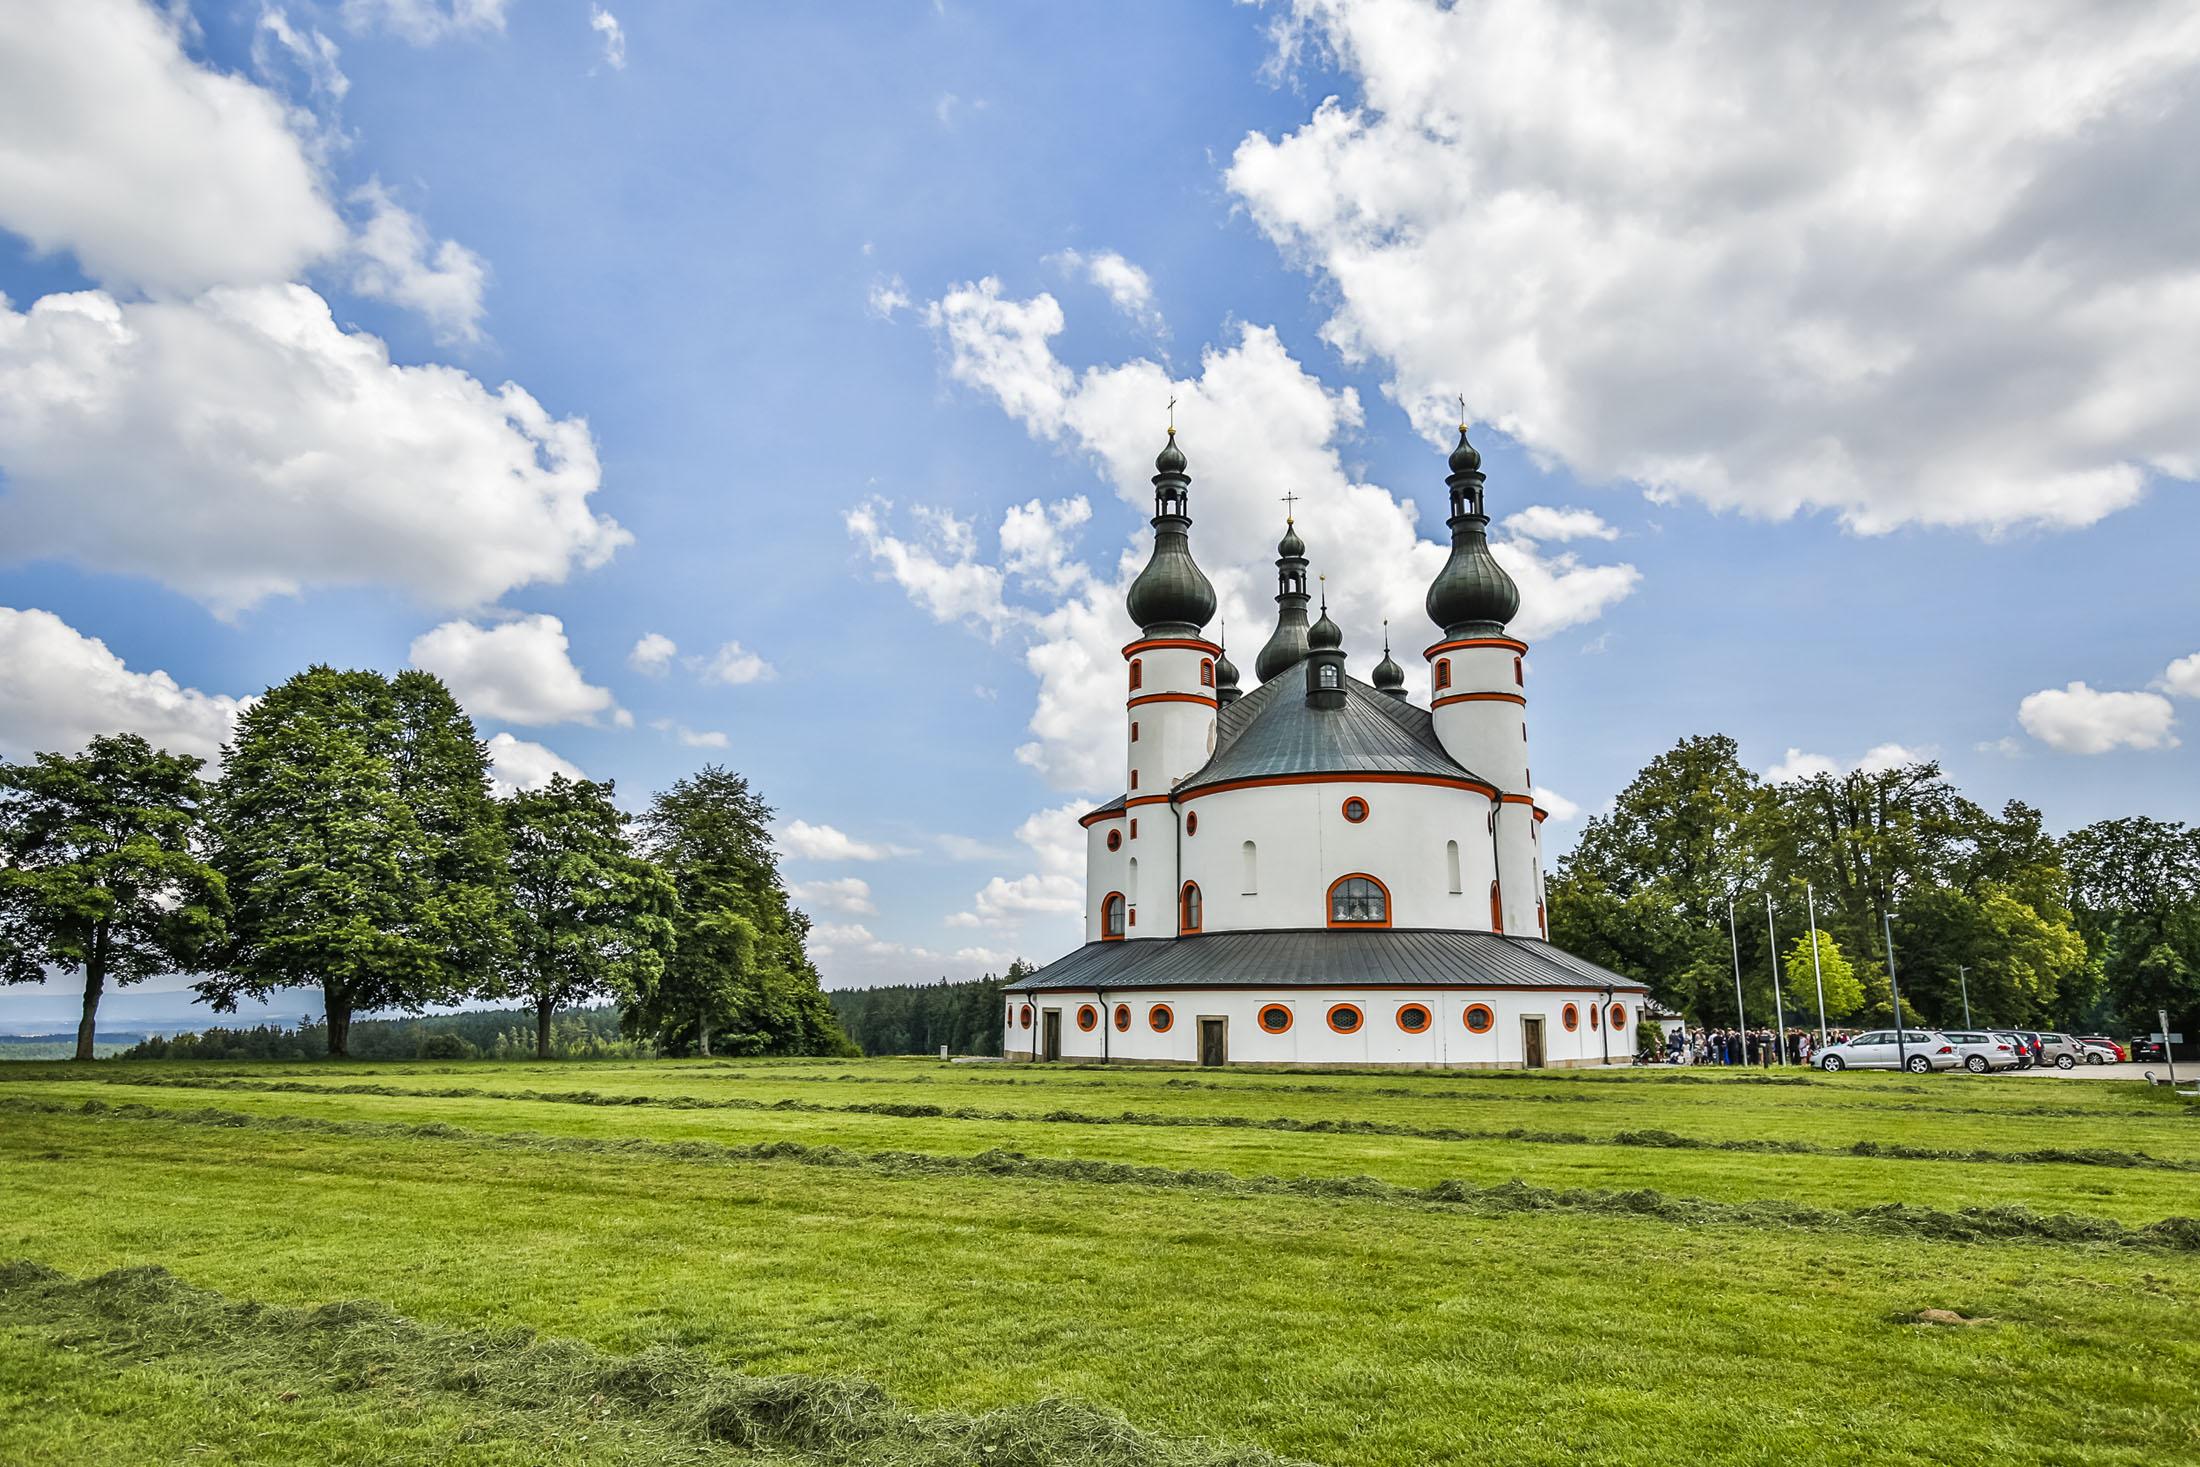 The Kappl Sanctuary of the Holy Trinity (Waldsassen)